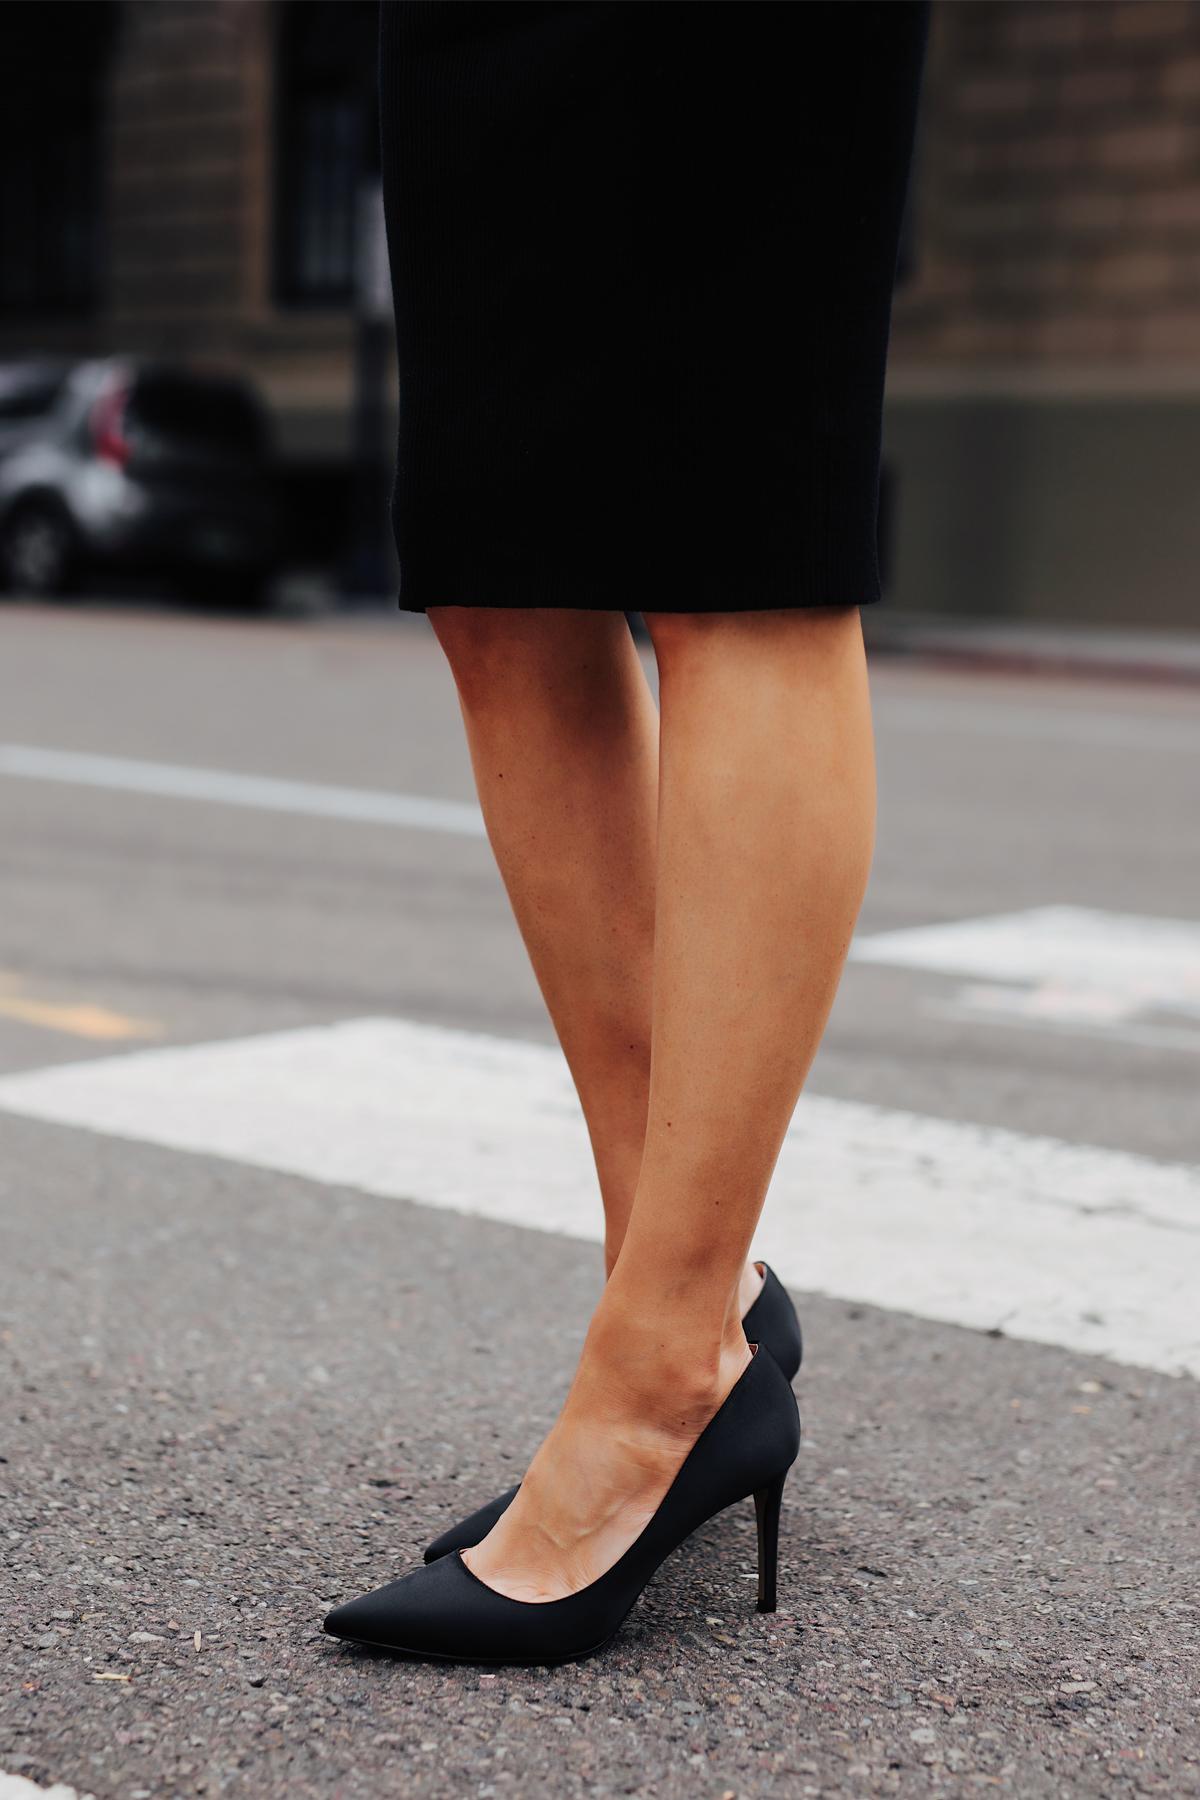 Fashion Jackson Wearing Black Midi Dress Black Pumps